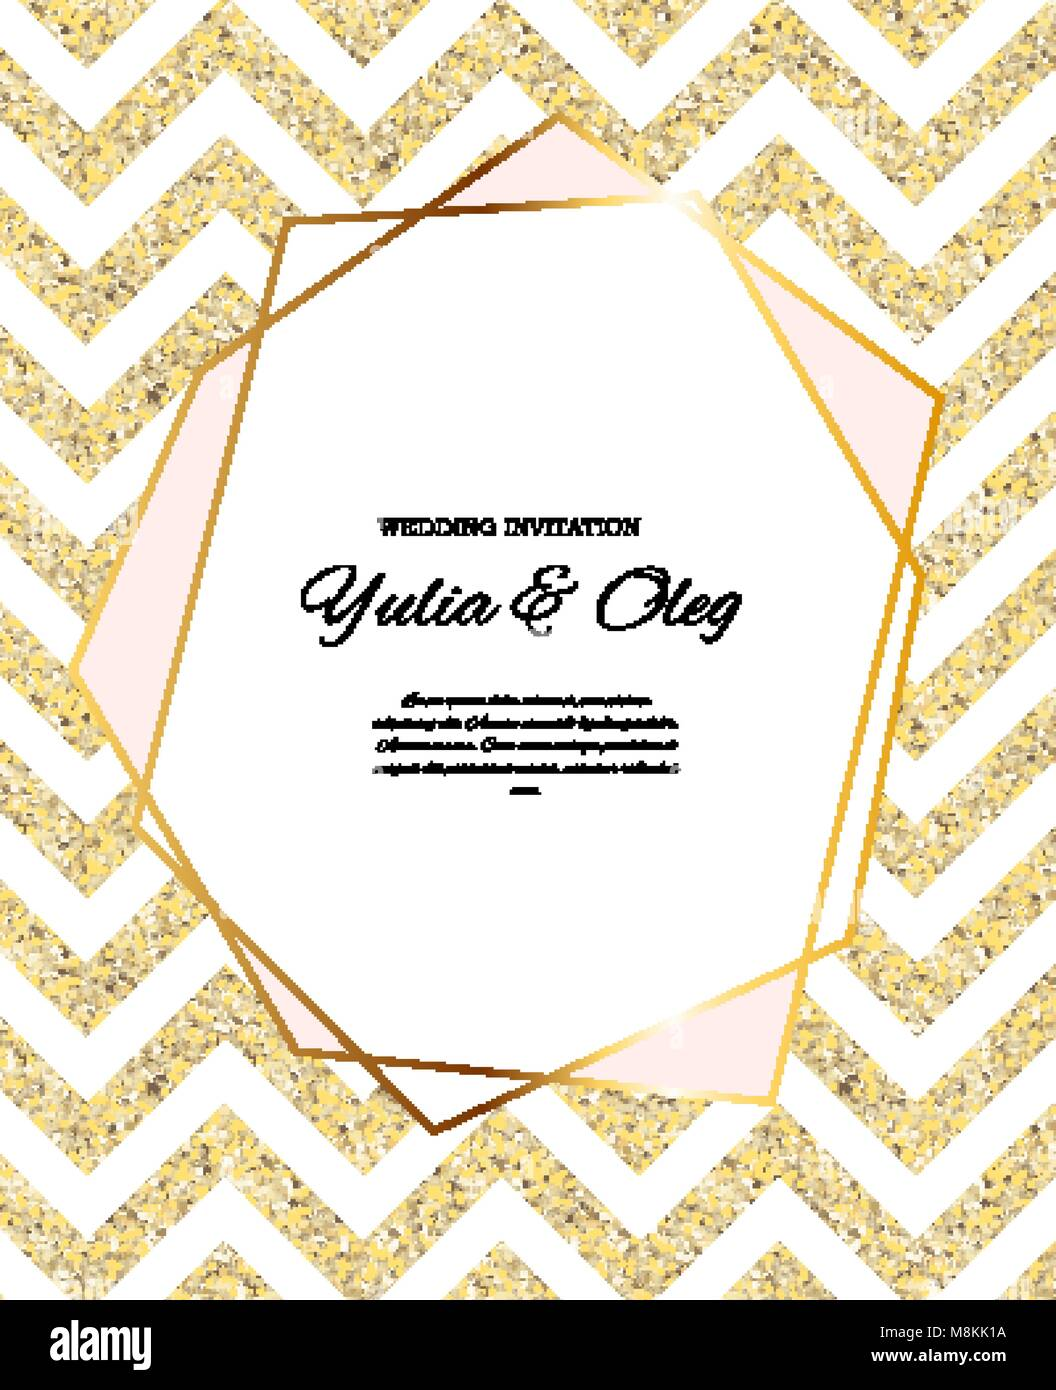 Beautifil wedding invitation with golden glitter background vector beautifil wedding invitation with golden glitter background vector illustration stopboris Image collections